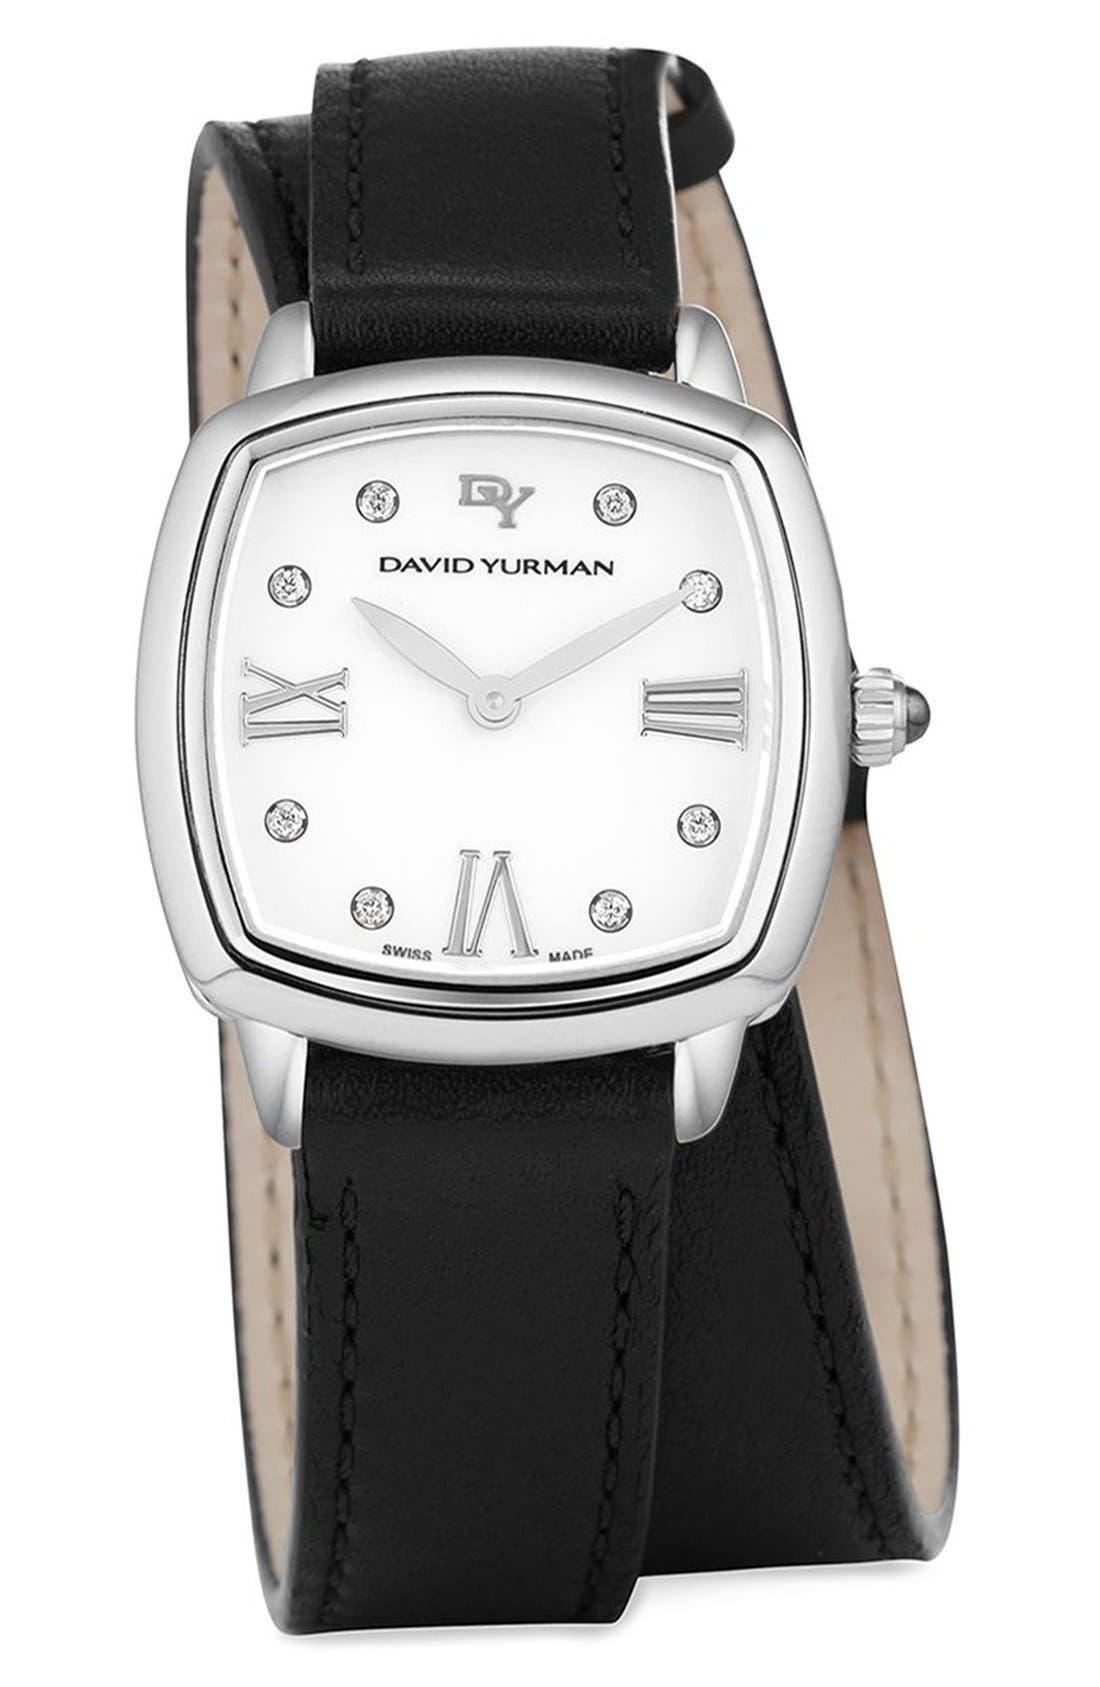 Main Image - David Yurman 'Albion' 27mm Leather Swiss Quartz Watch with Diamonds